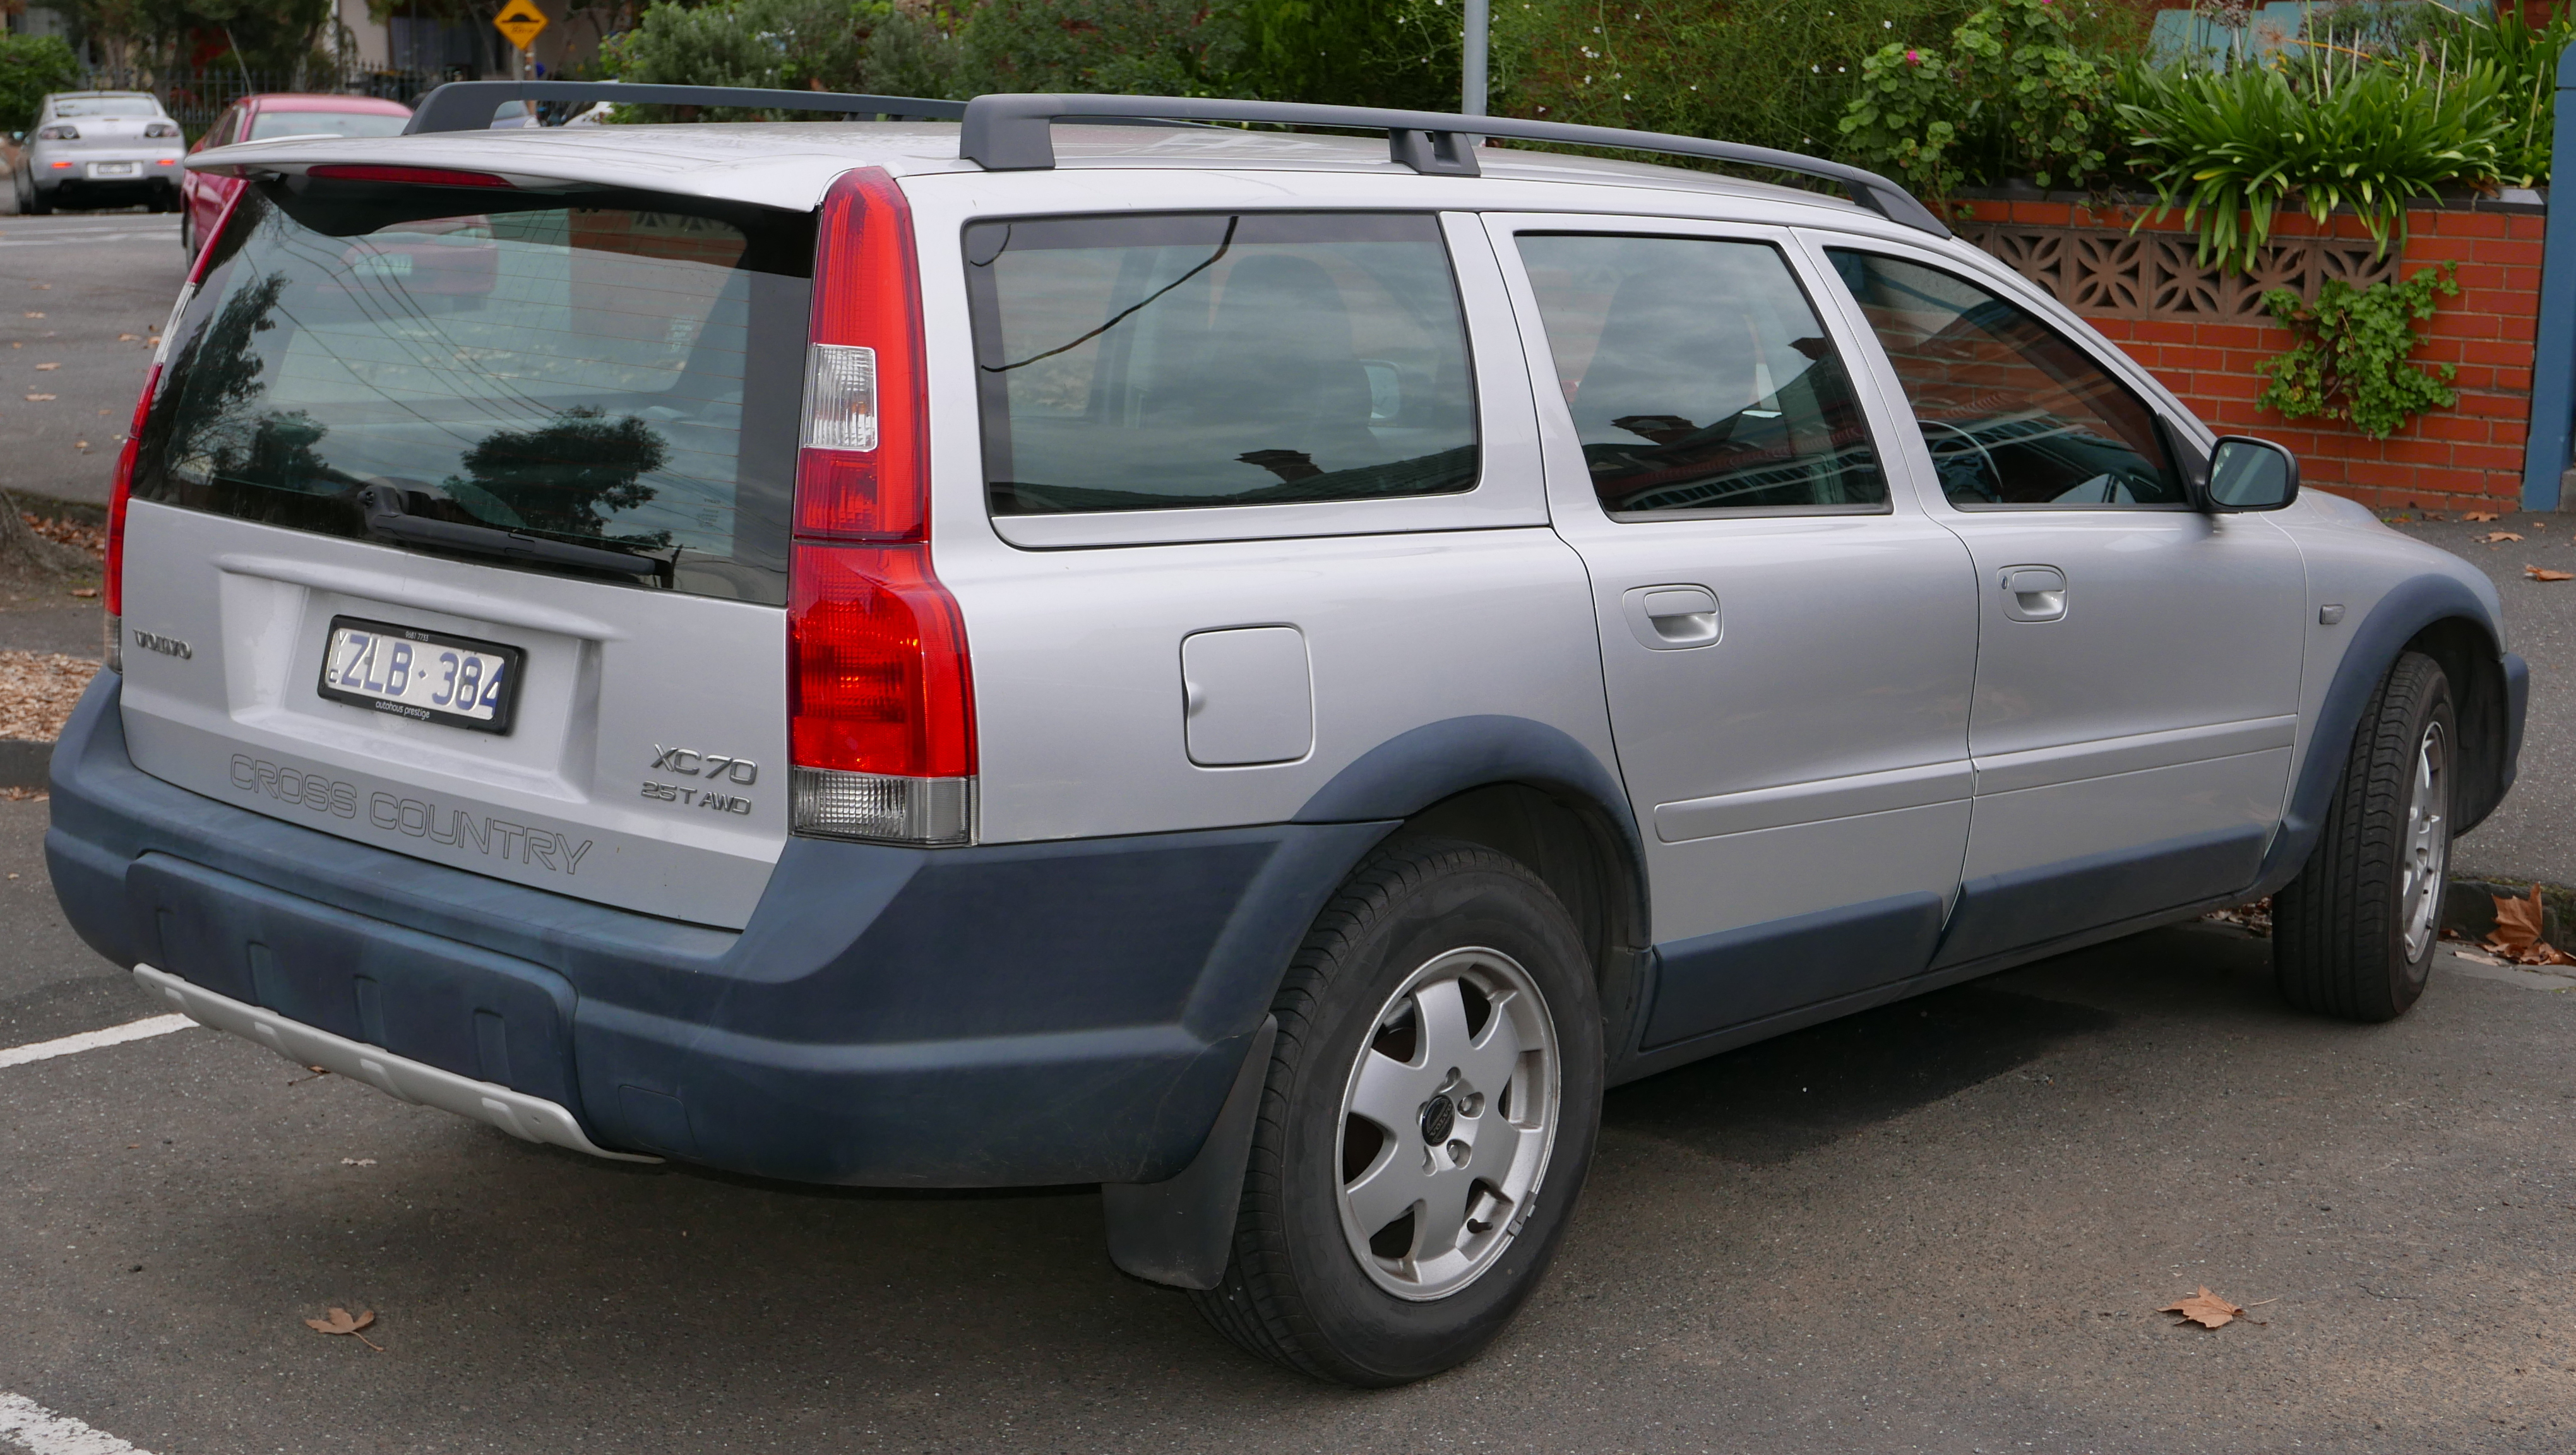 Volvo XC70 I 2000 - 2004 Station wagon 5 door #1